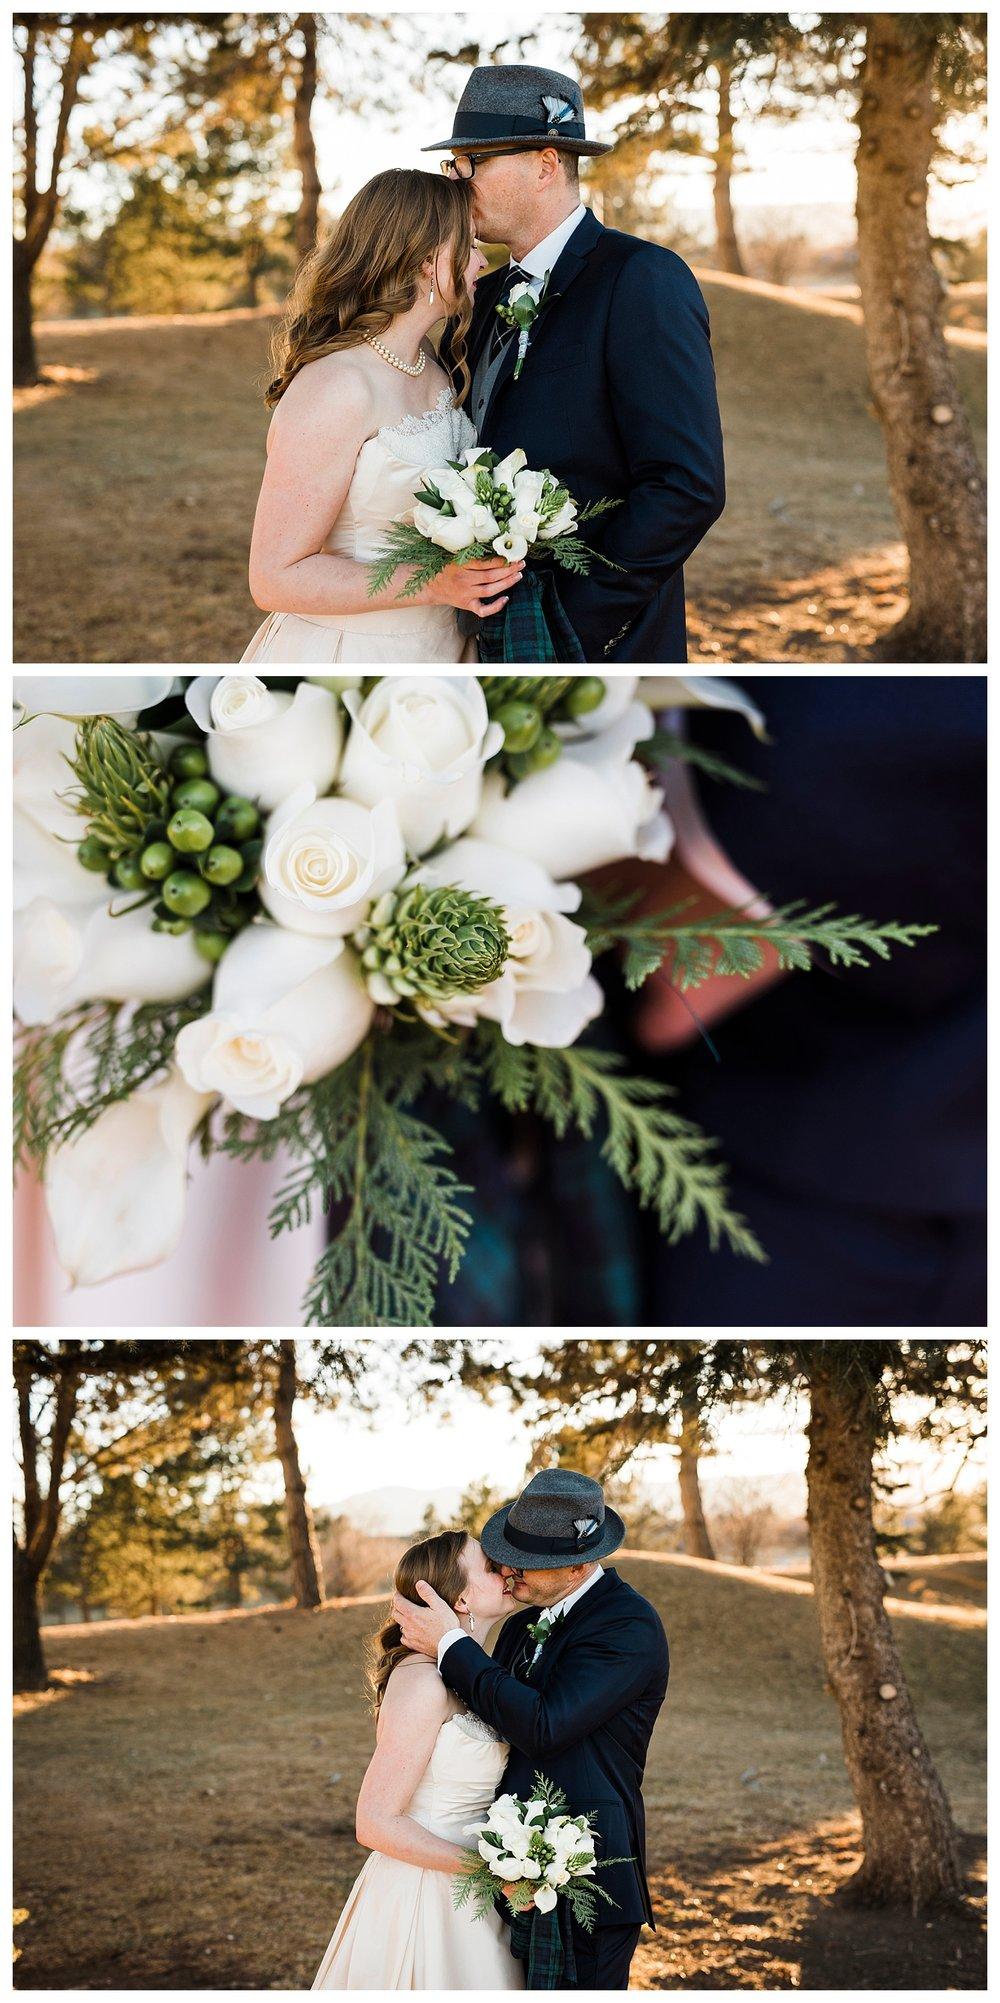 Florist_The_Barn_At_Raccoon_Creek_Wedding_Apollo_Fields_039.jpg